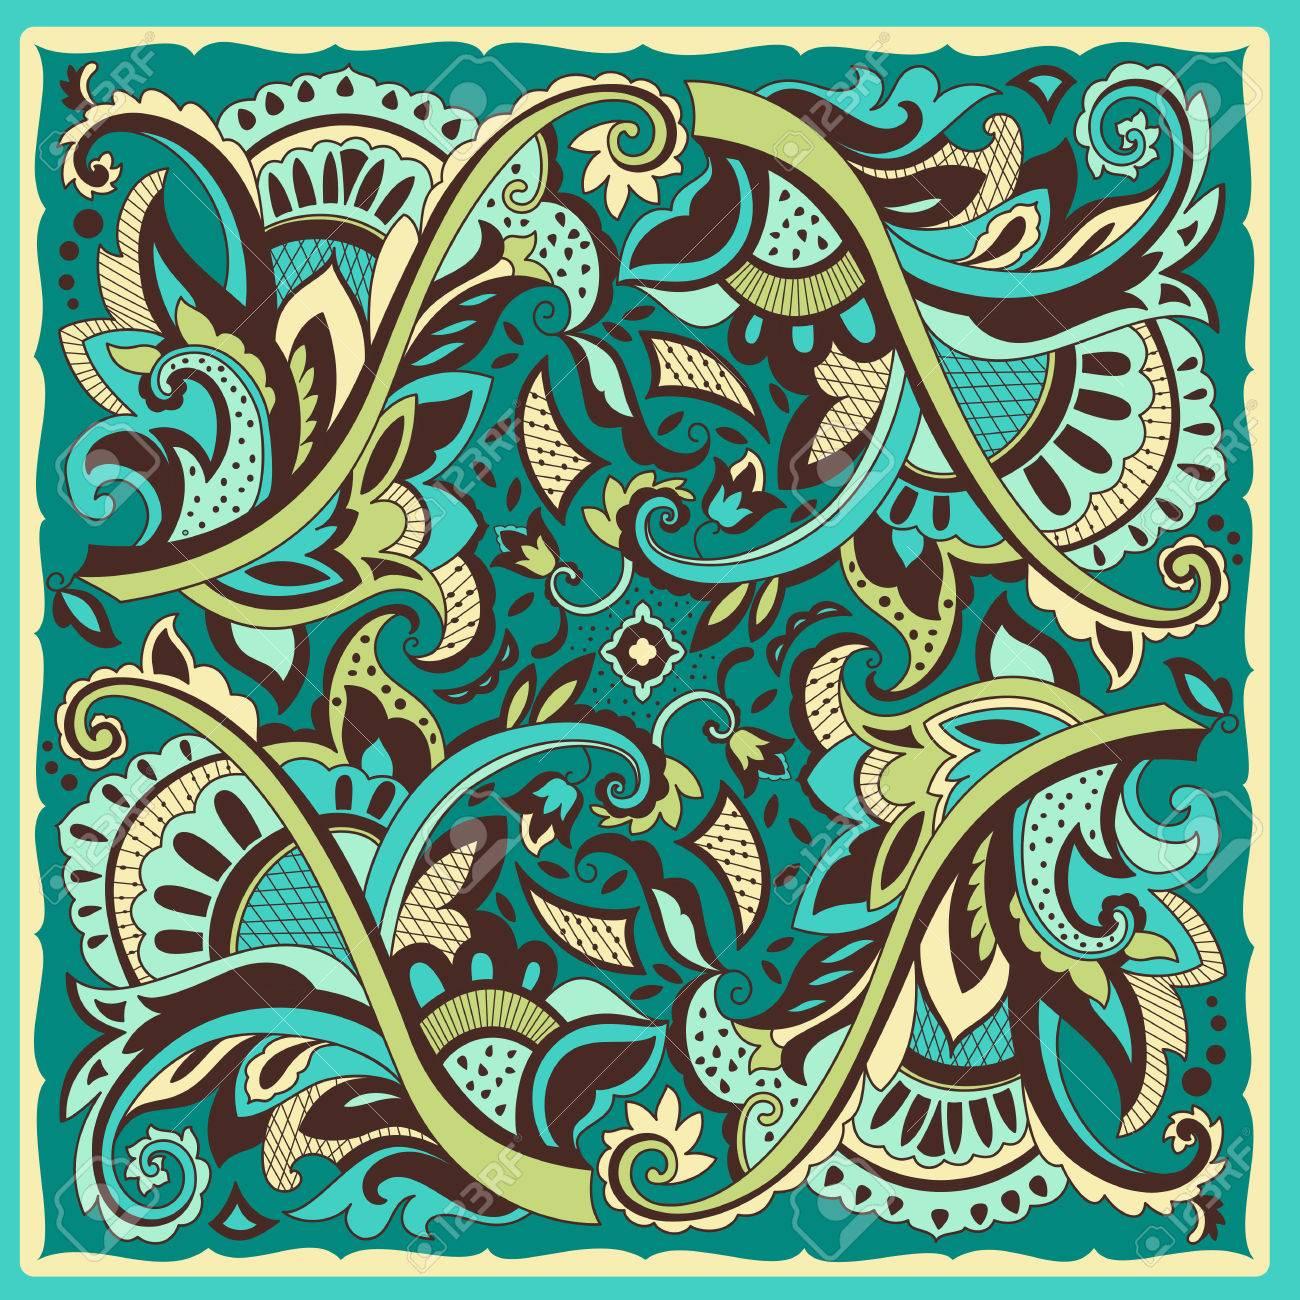 decorative motif for ceramic tiles paper napkins and handkerchiefs design wrapping paper vector - Decorative Paper Napkins